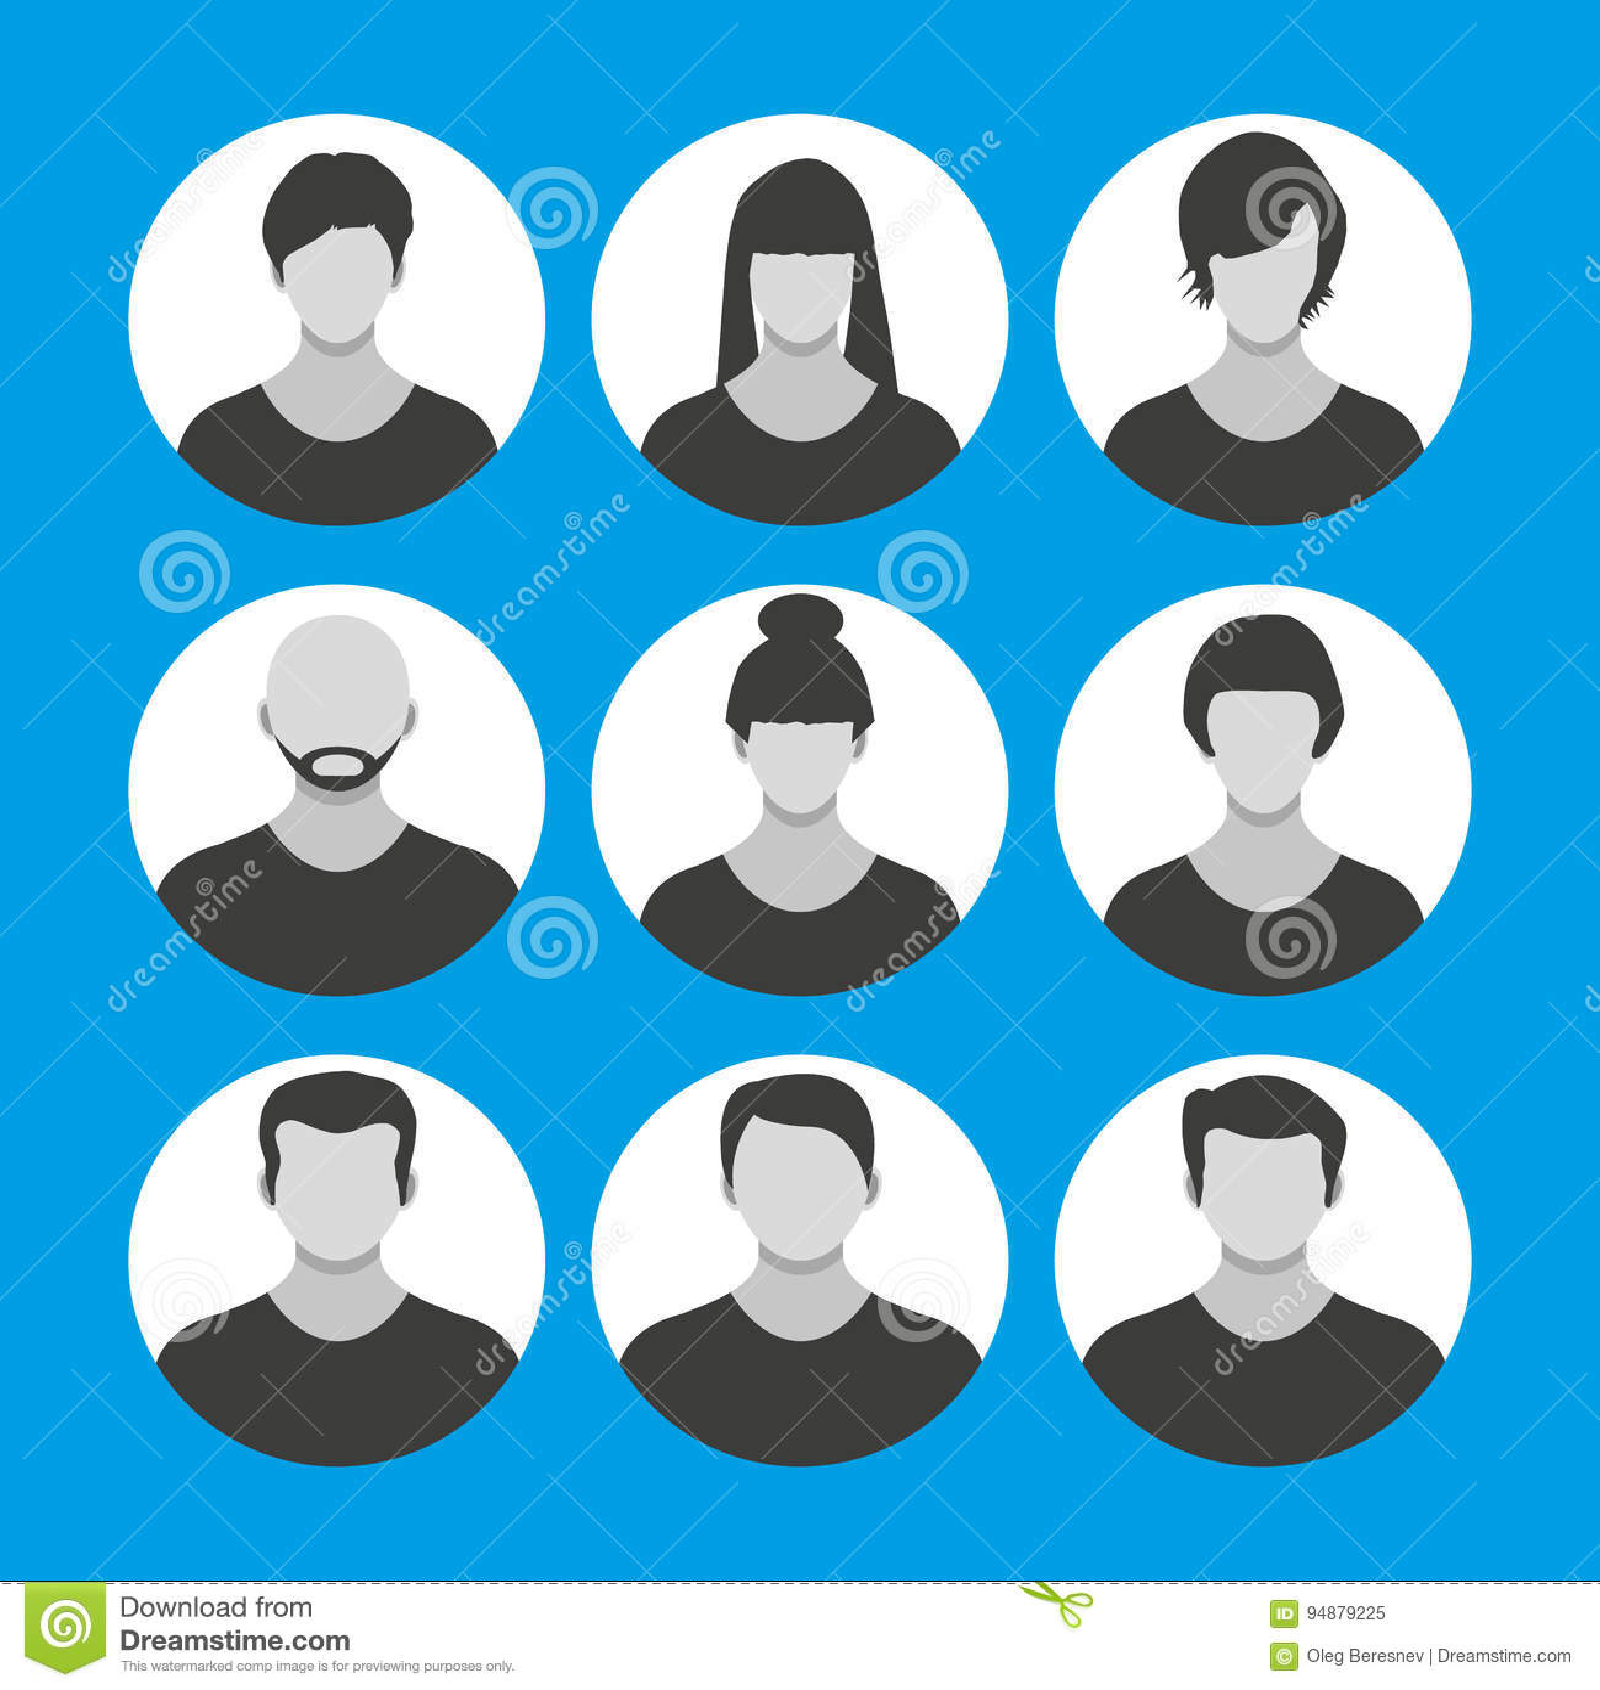 black bald cartoon character people face, avatar icon, cartoon character stock vector